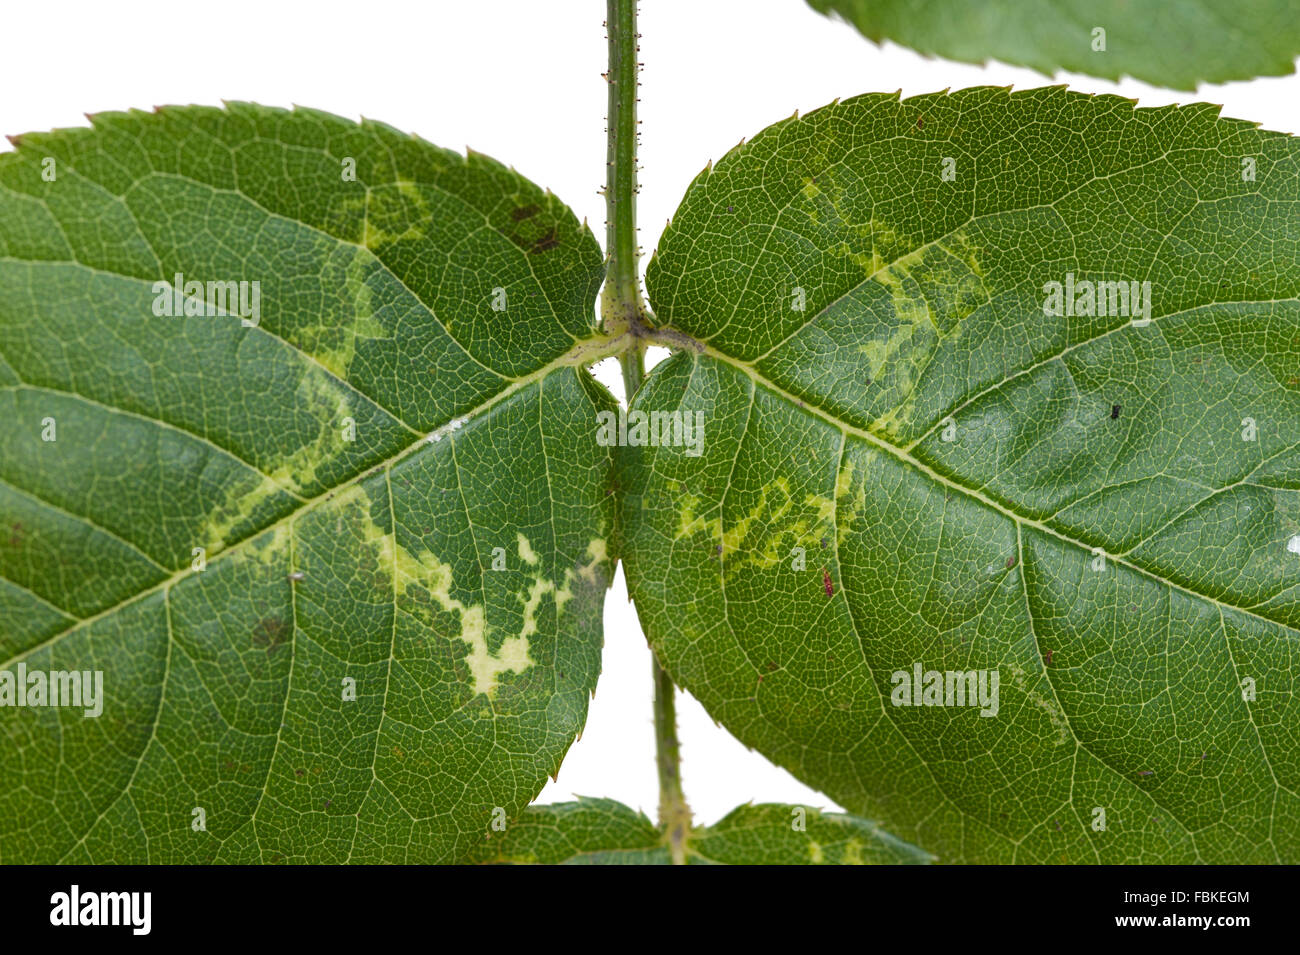 Rose mosaic virus symptoms on rose leaf - Stock Image